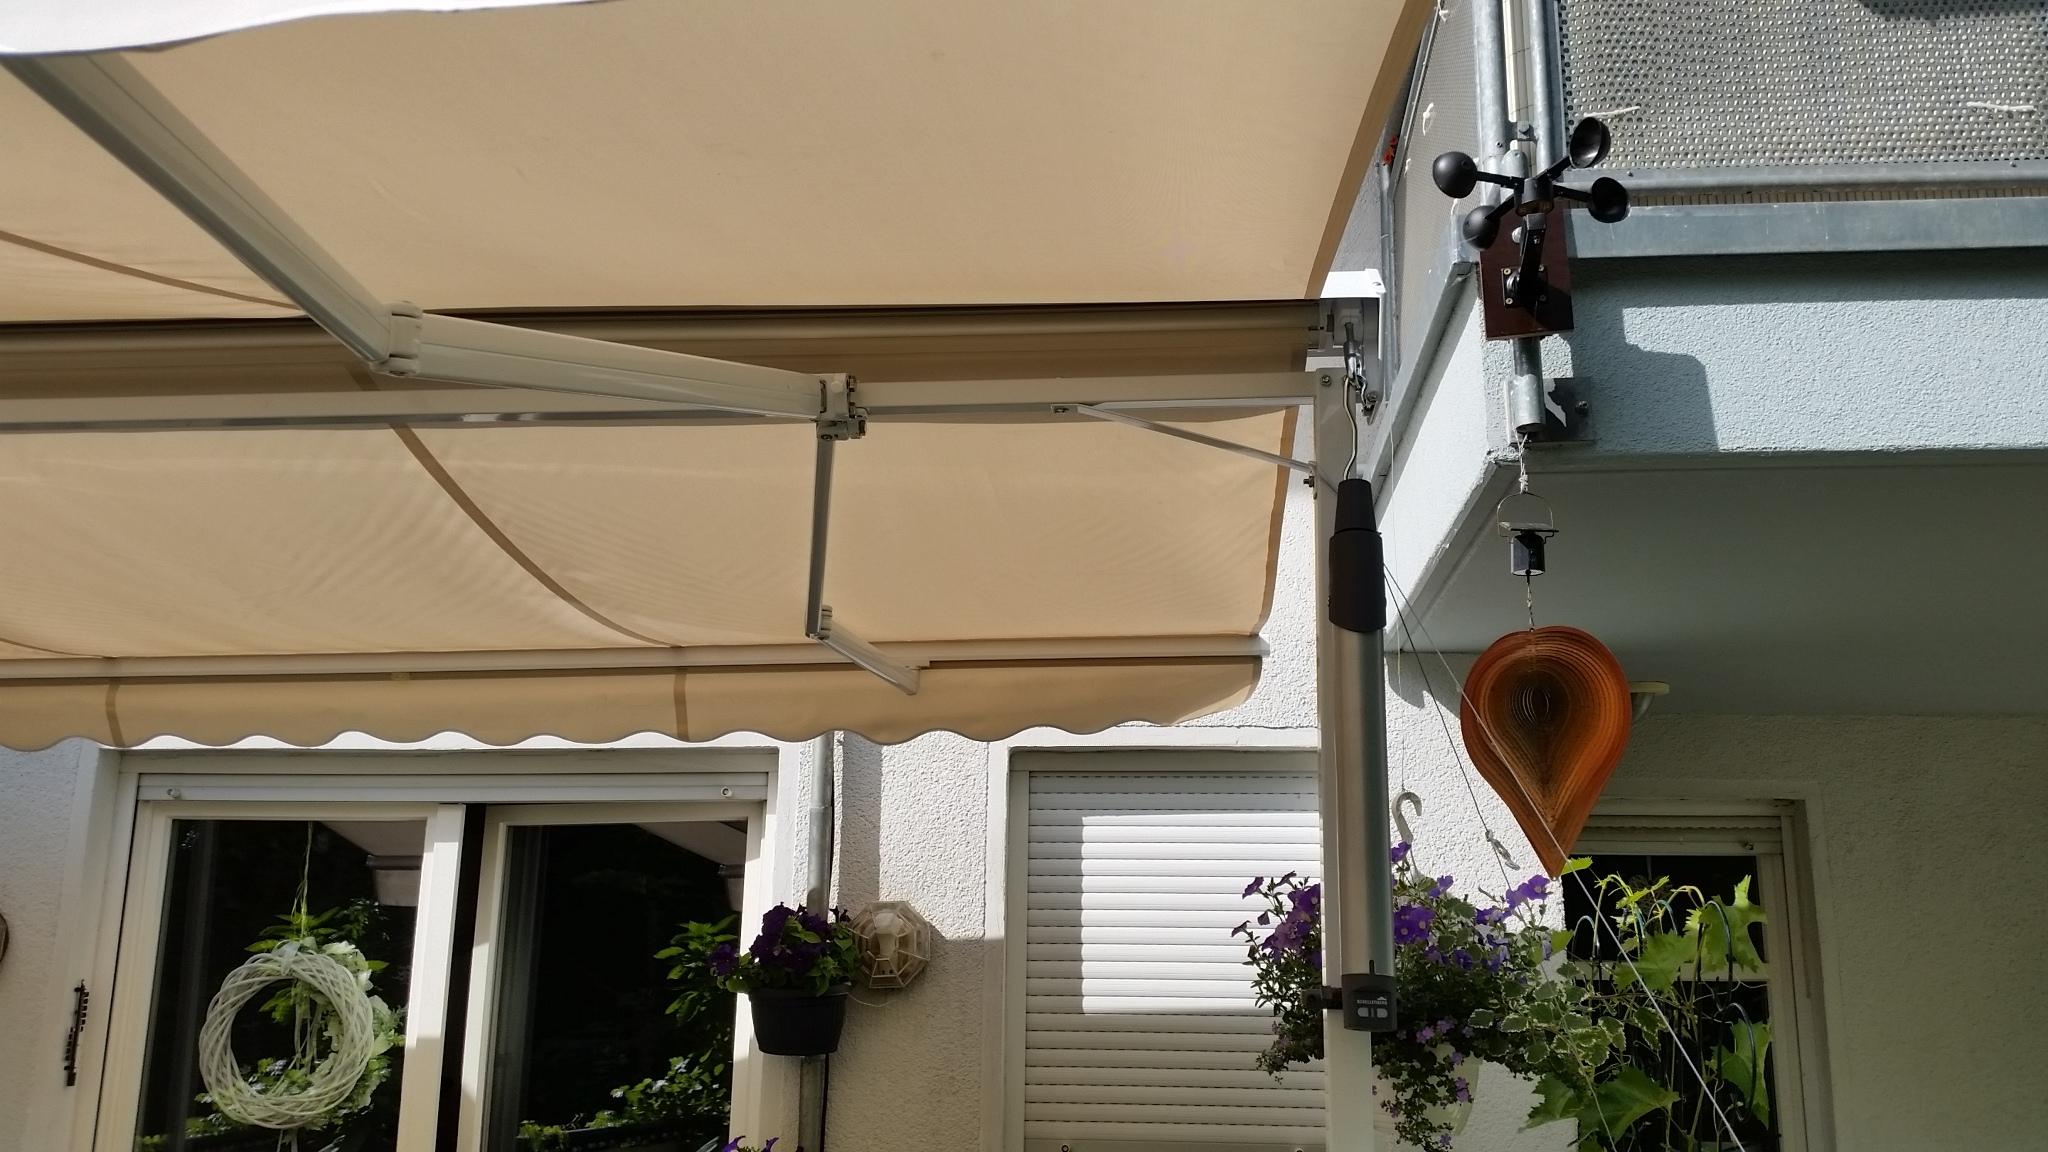 markise amazon free einfach klemm markisen fr balkon nach. Black Bedroom Furniture Sets. Home Design Ideas